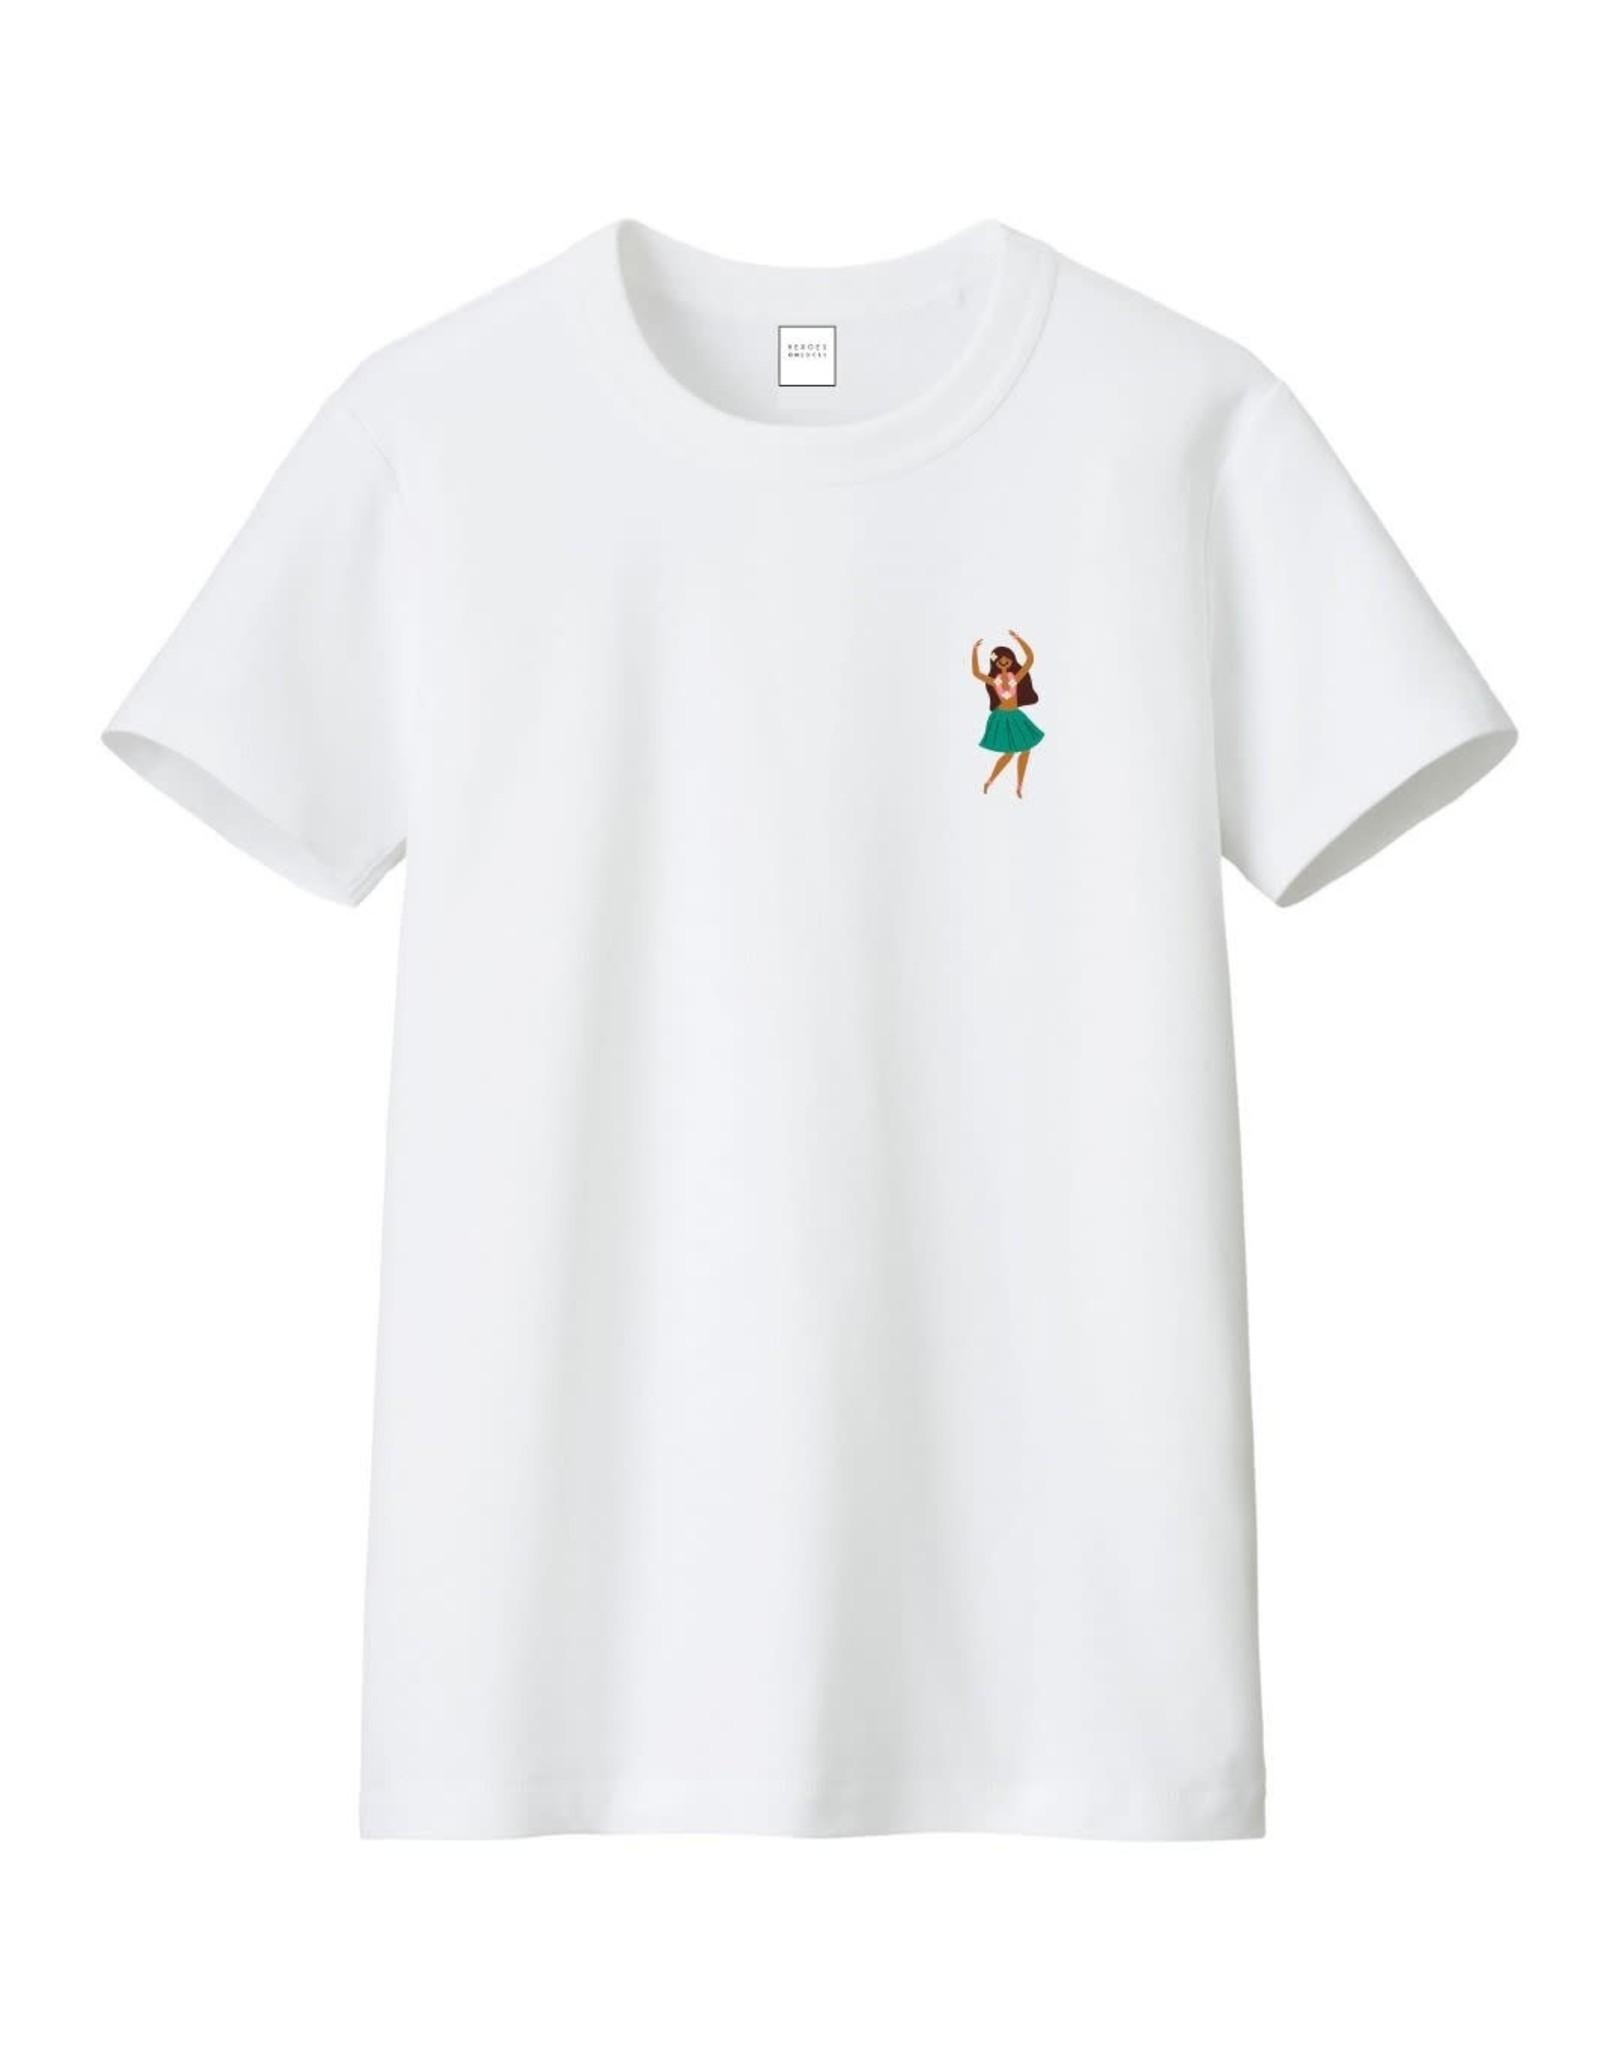 Heroes on Socks Hula Girl T-Shirt